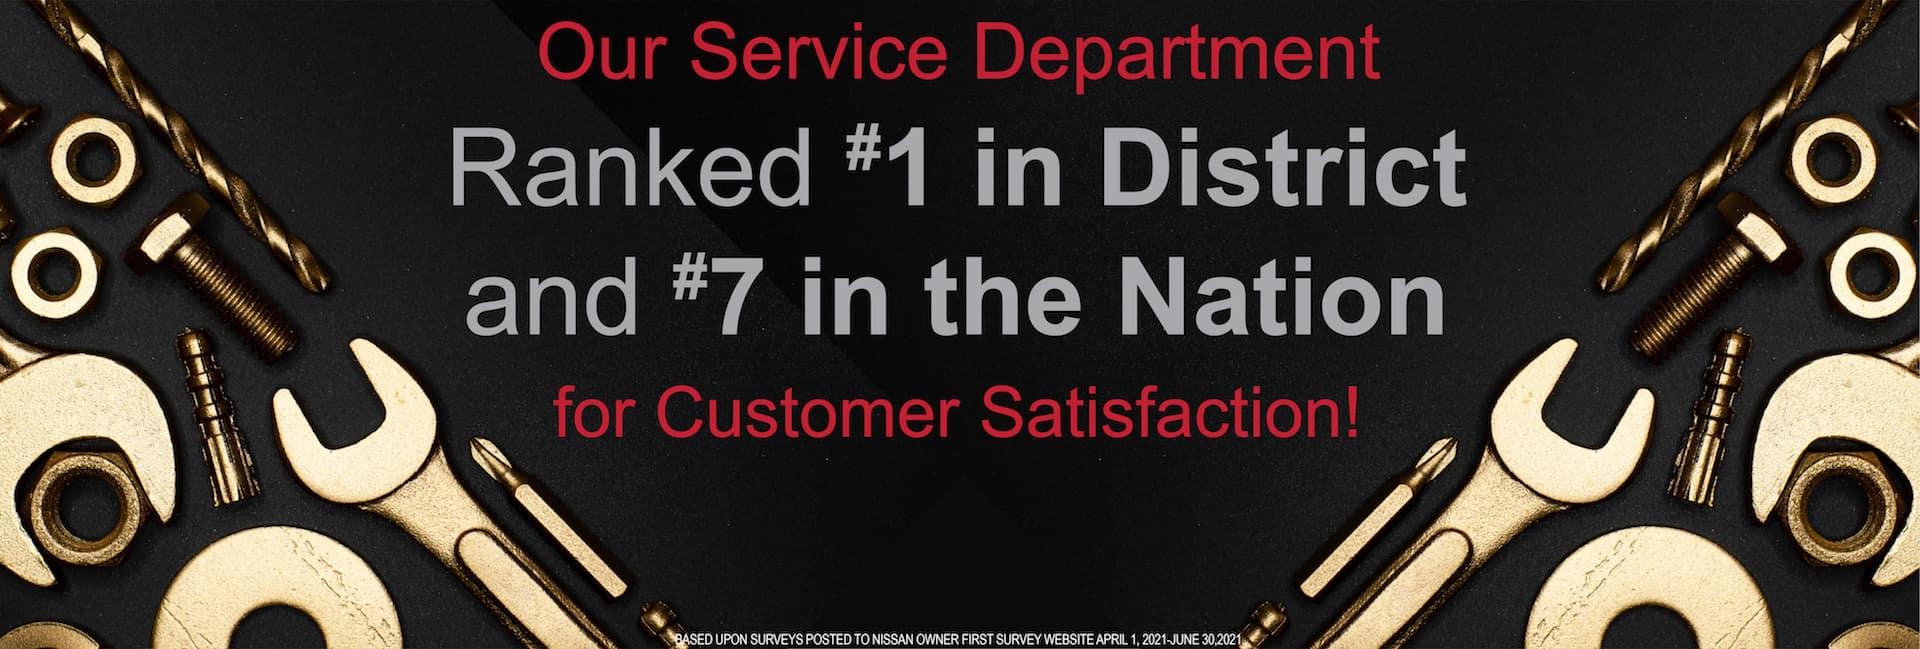 Service Accolade_Website Banner